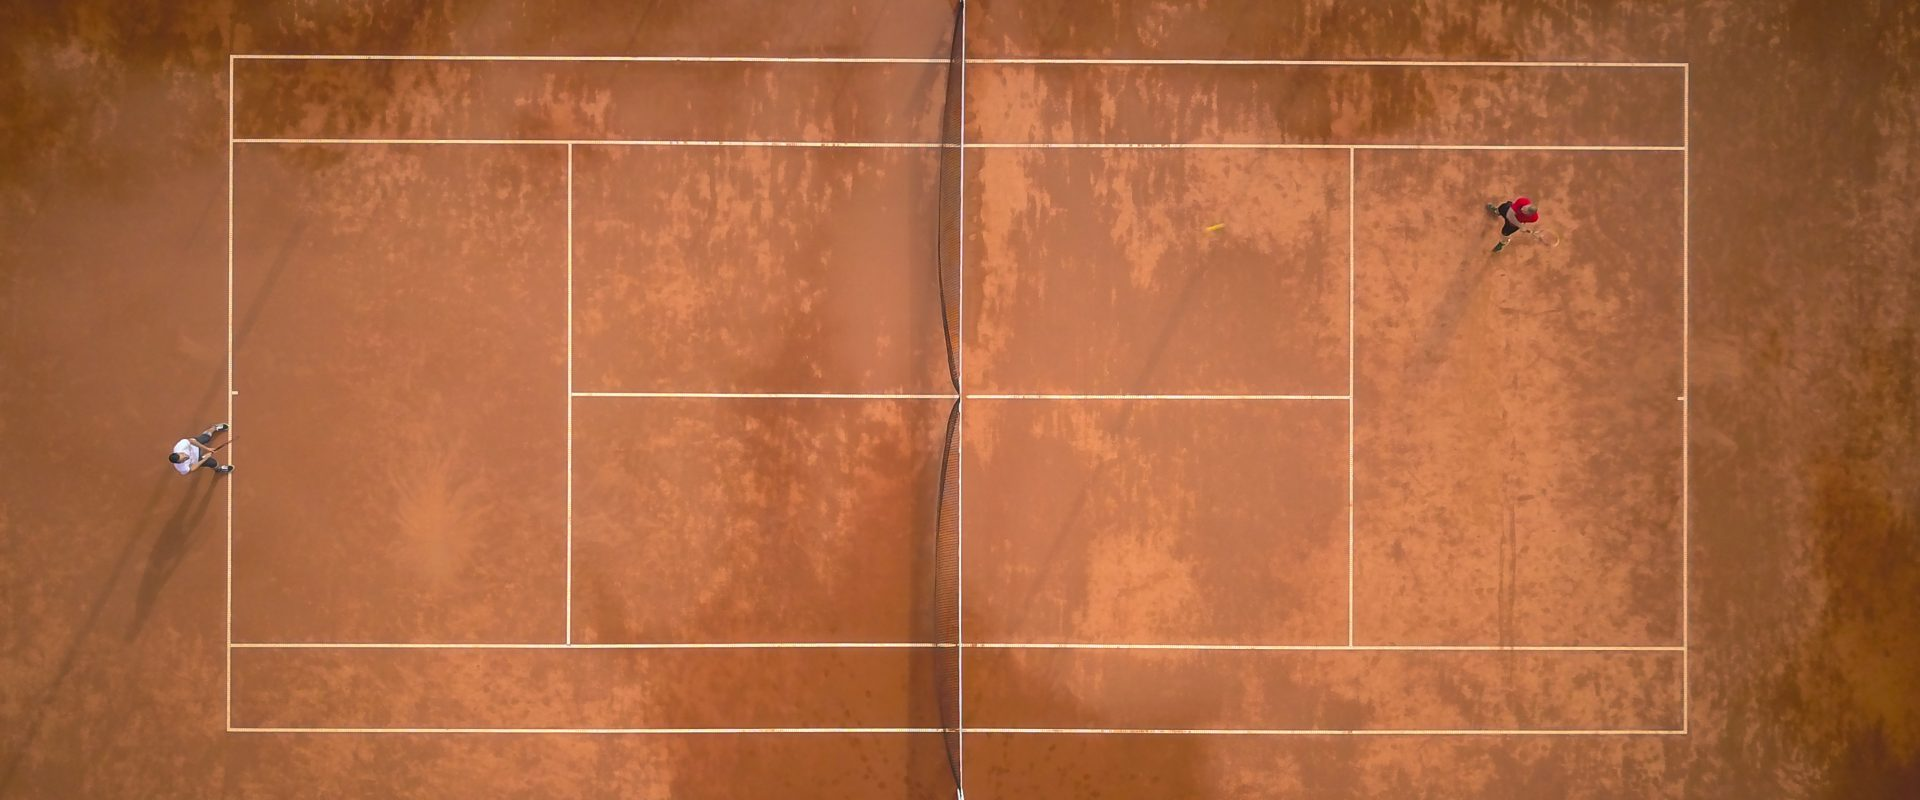 vista aérea de pista de tenis de tierra batida